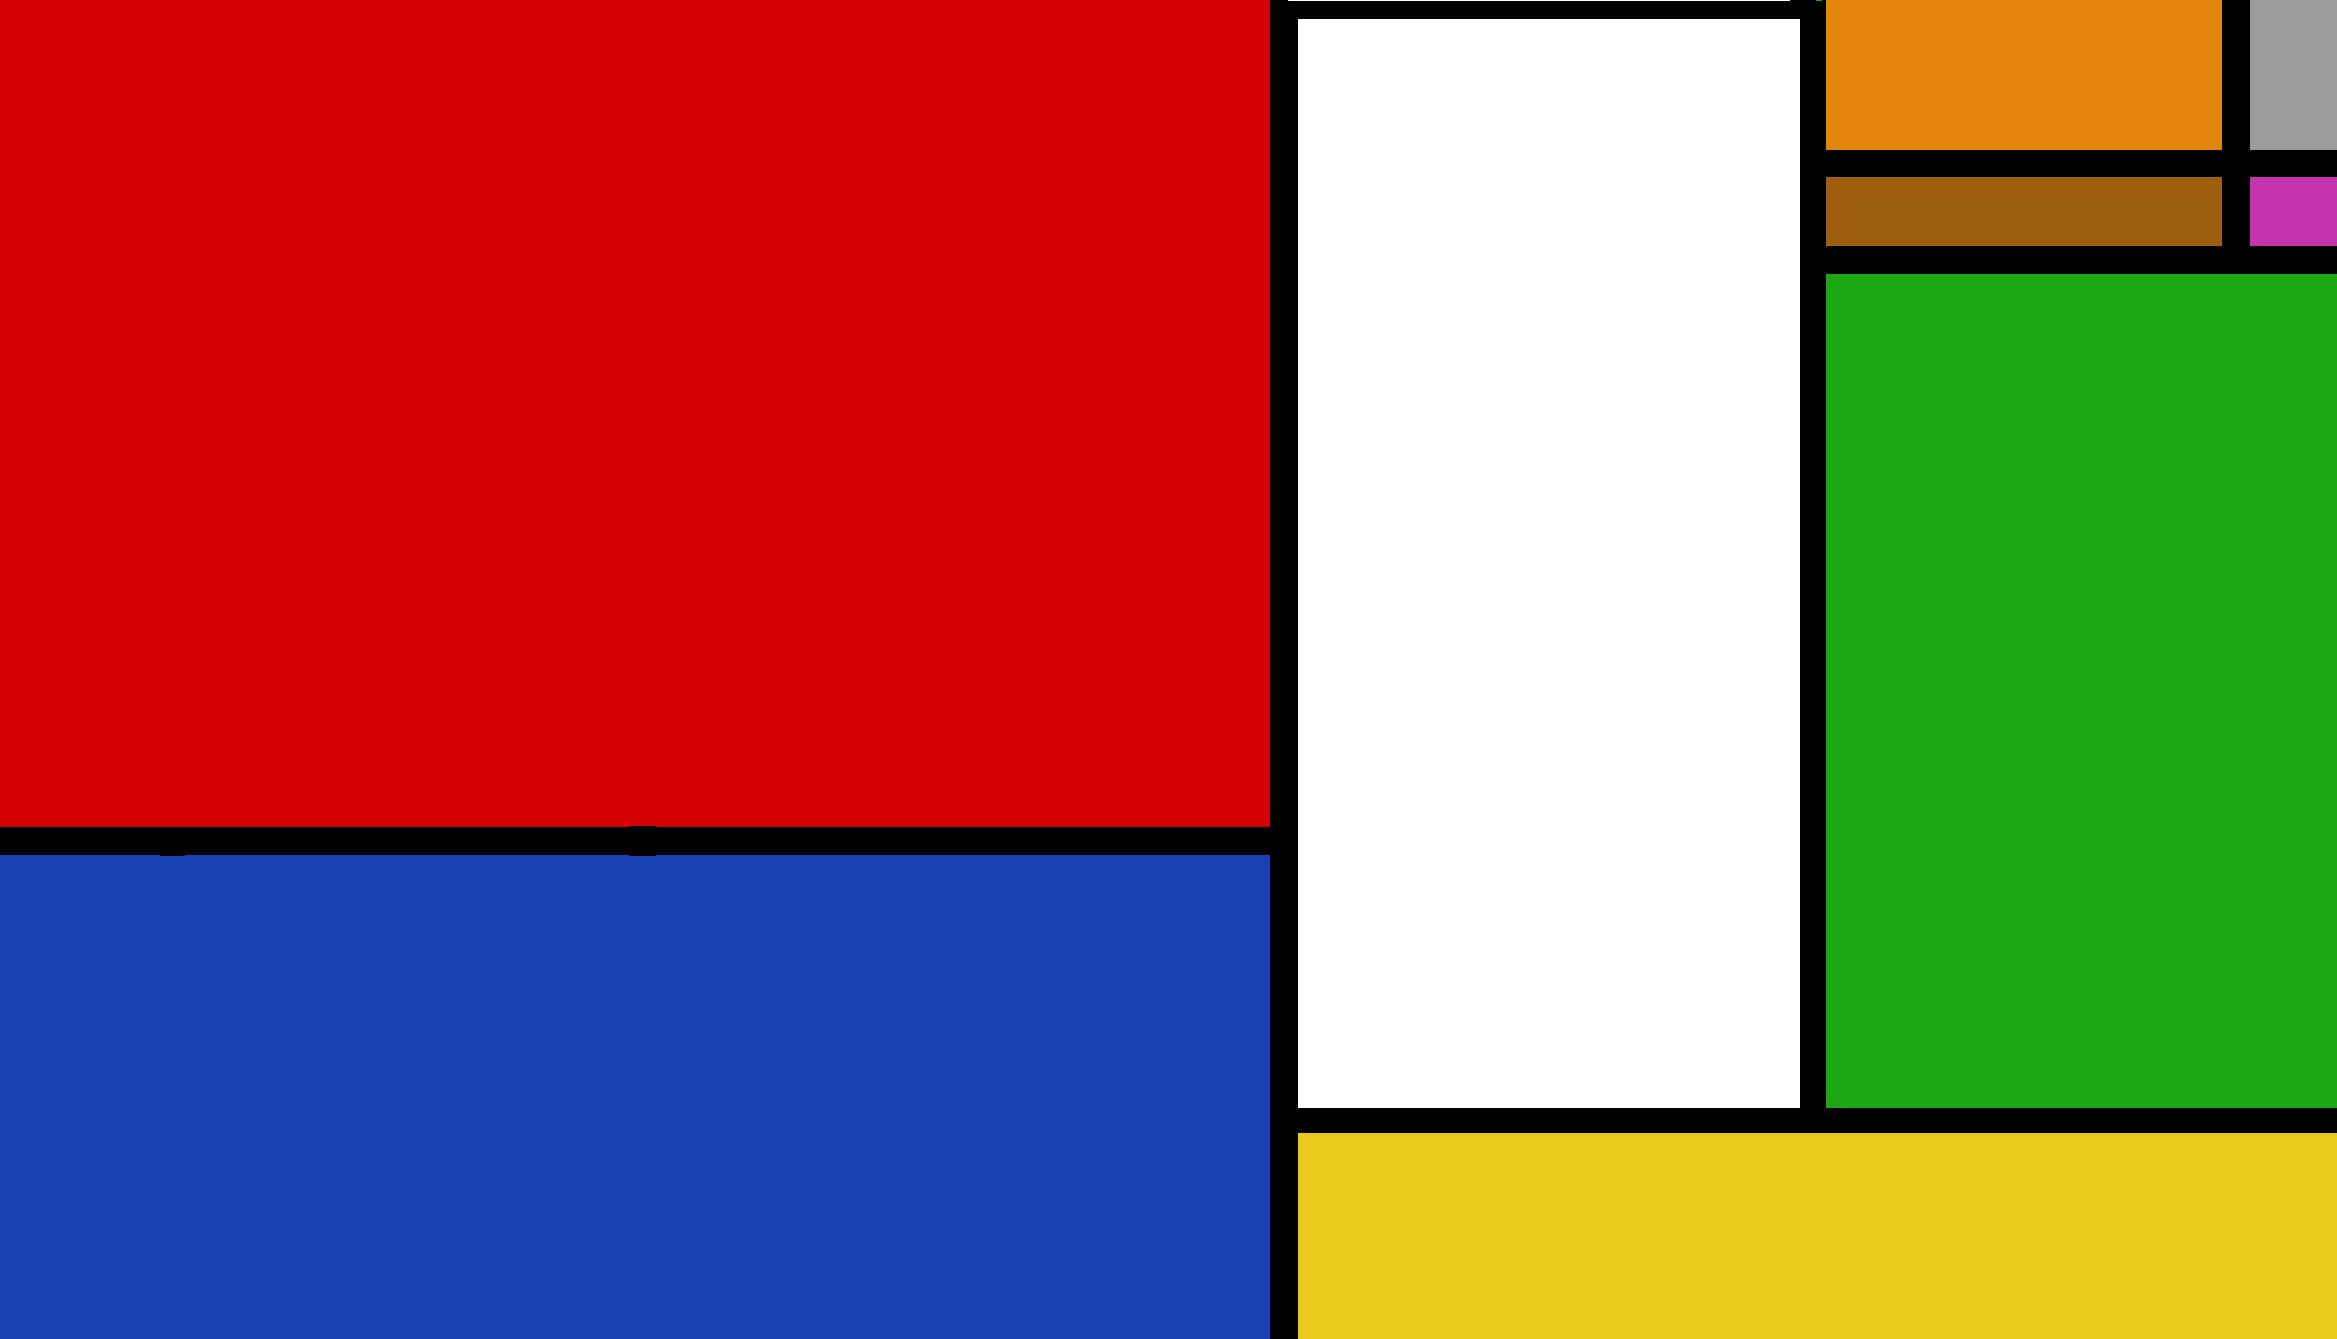 File World Flag By Brandpowder Team Jpg Wikimedia Commons